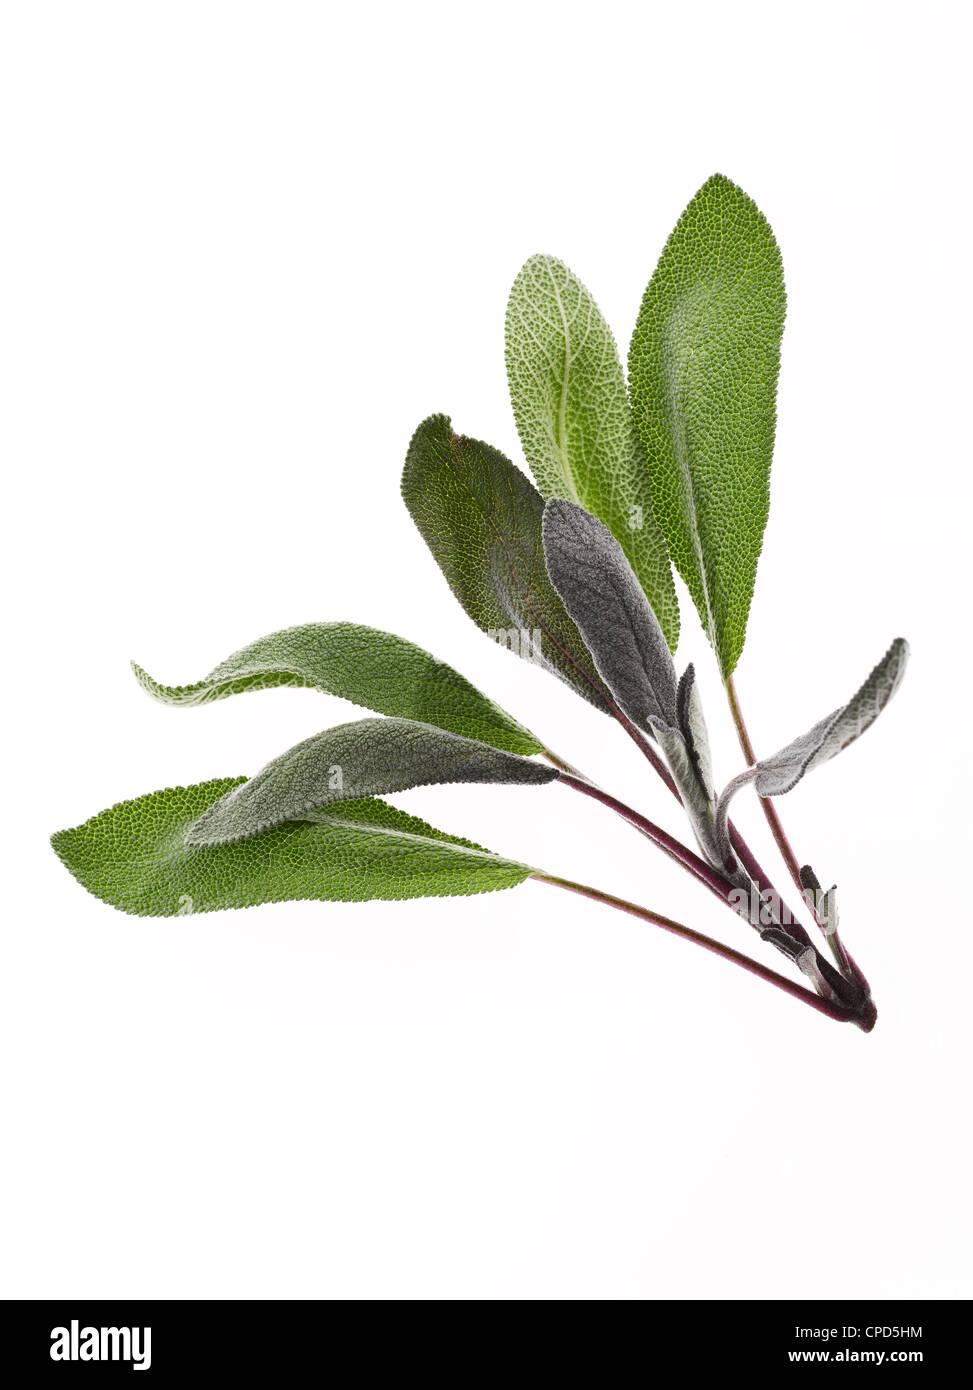 fresh sprig of sage leaves - Stock Image